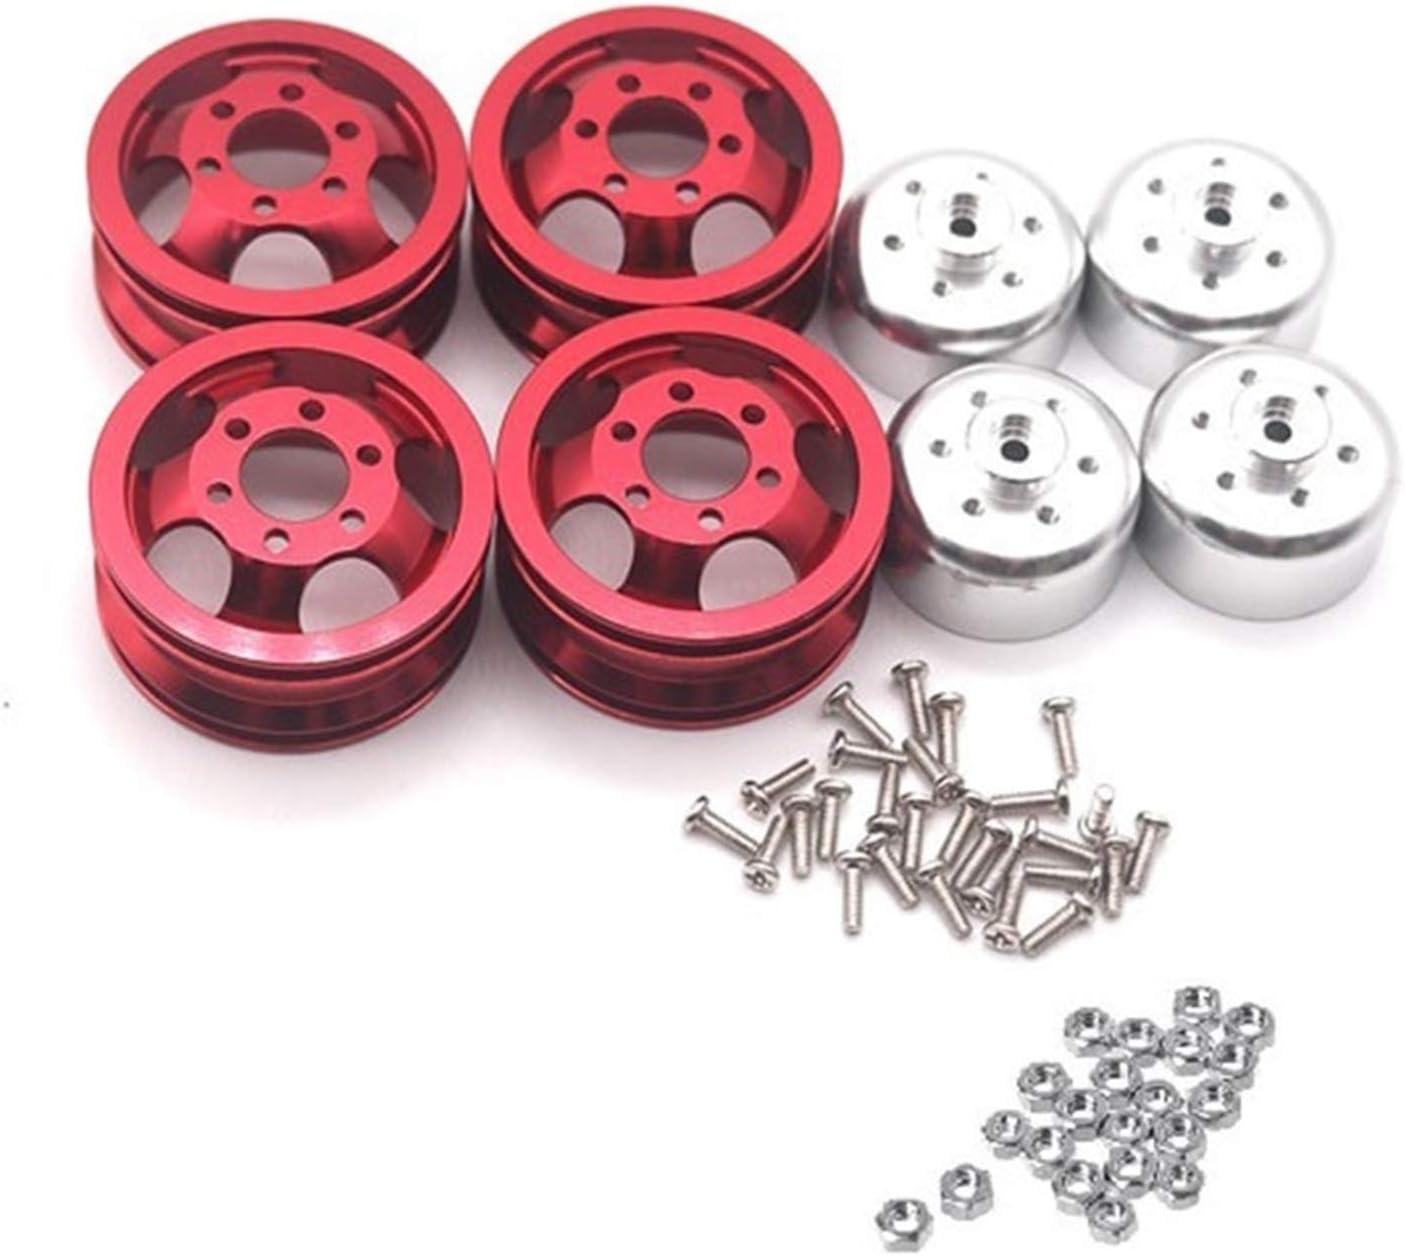 Zhusha Upgrade Lowest price challenge Metal 25% OFF Wheel Rim Kit Hub WPL B1 for Suitable